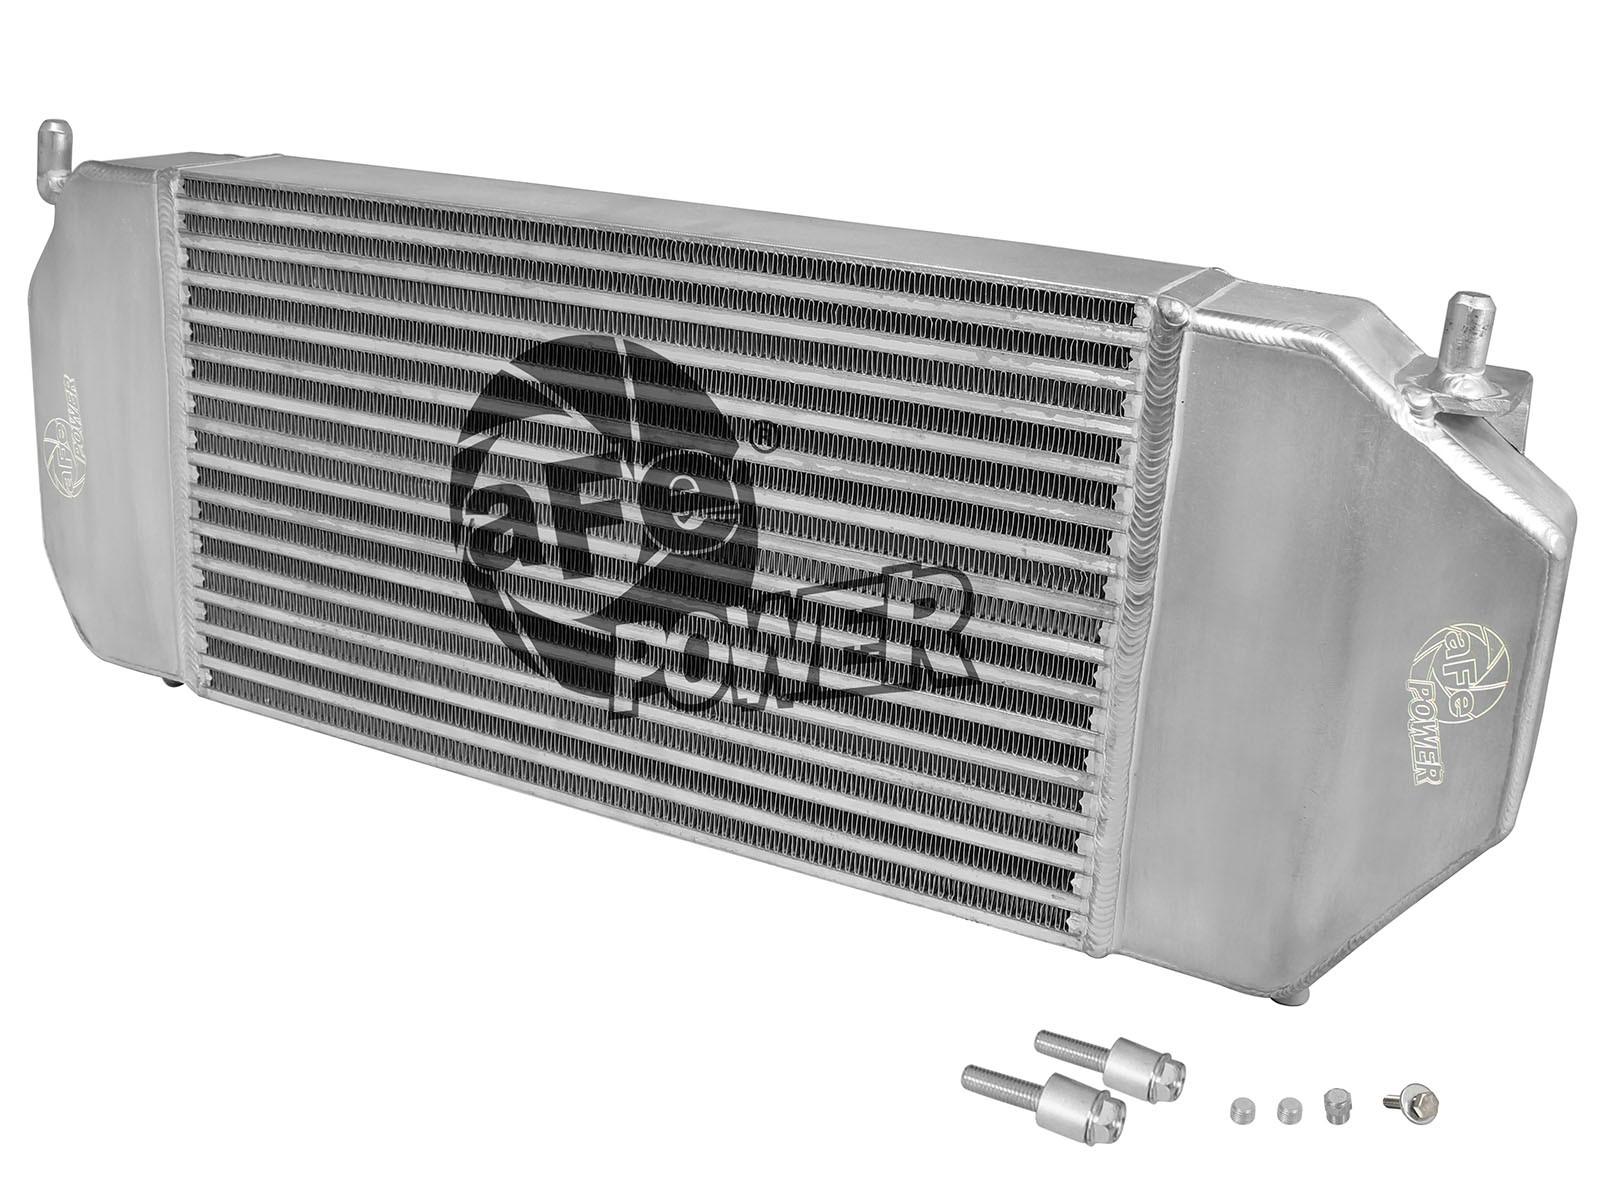 aFe POWER 46-20201 BladeRunner GT Series Intercooler